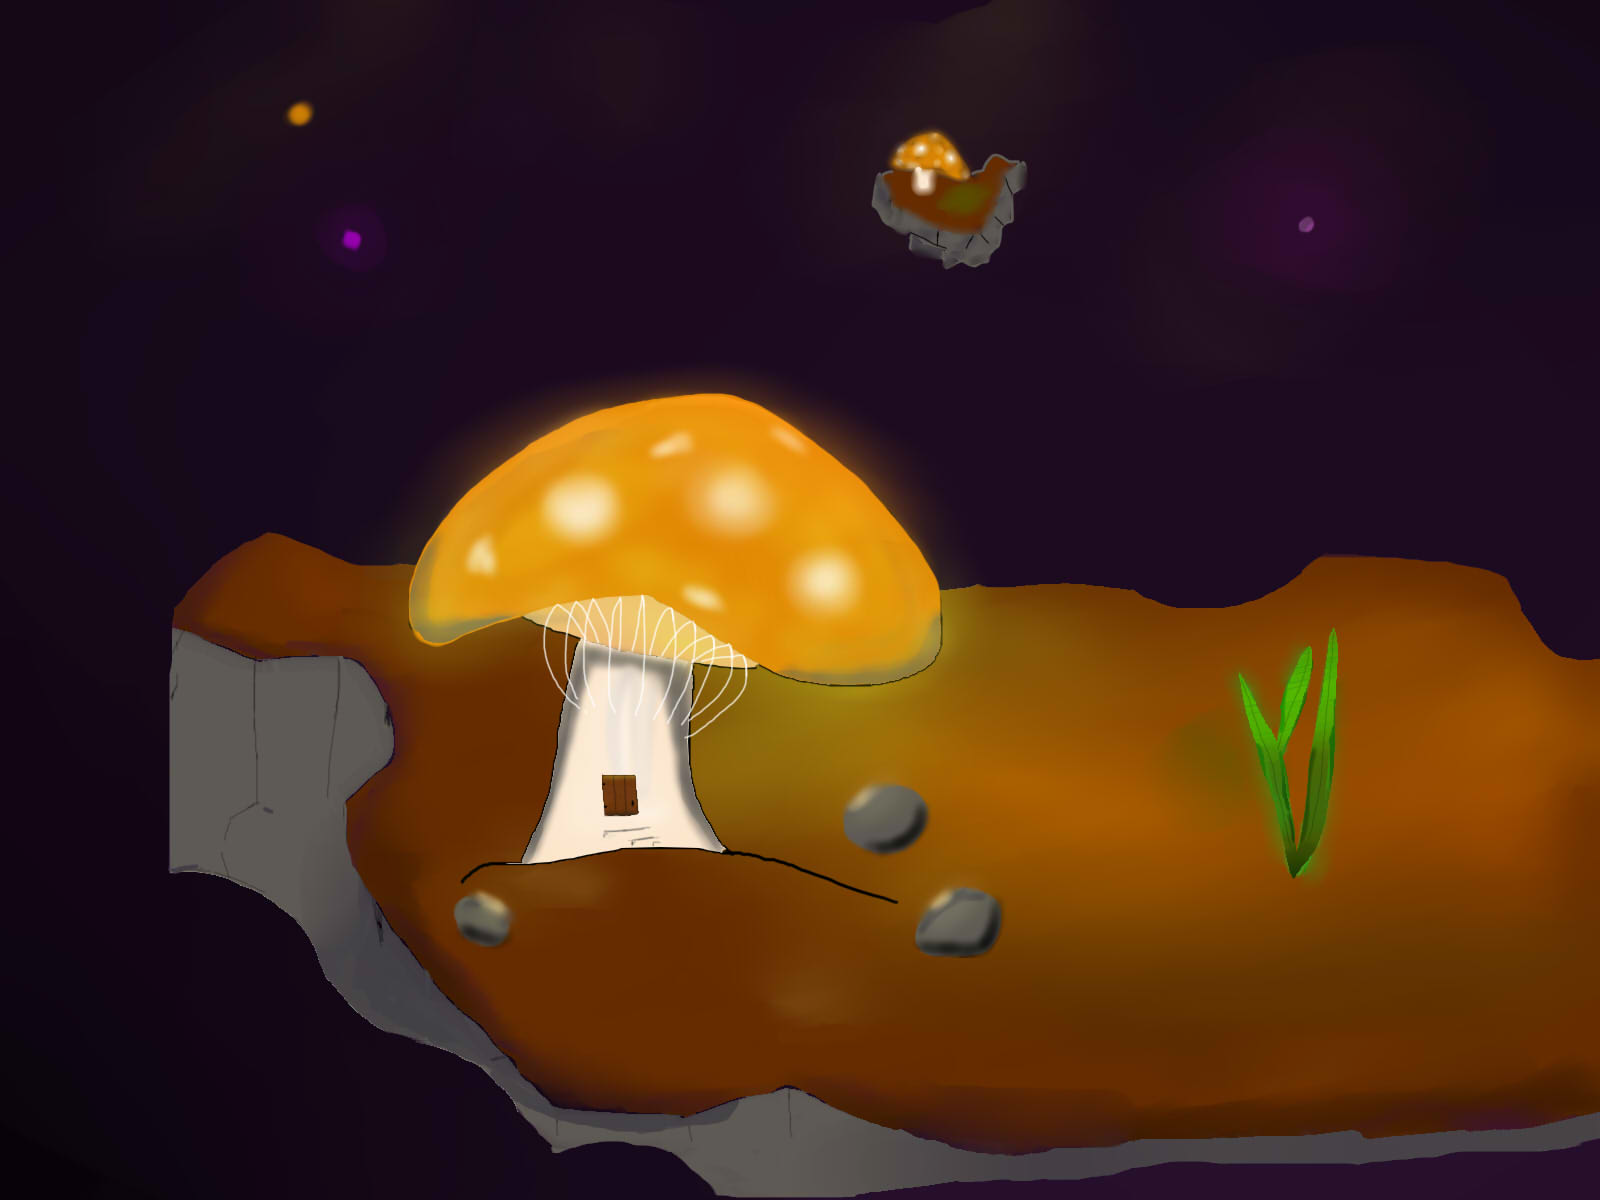 The mushroomman